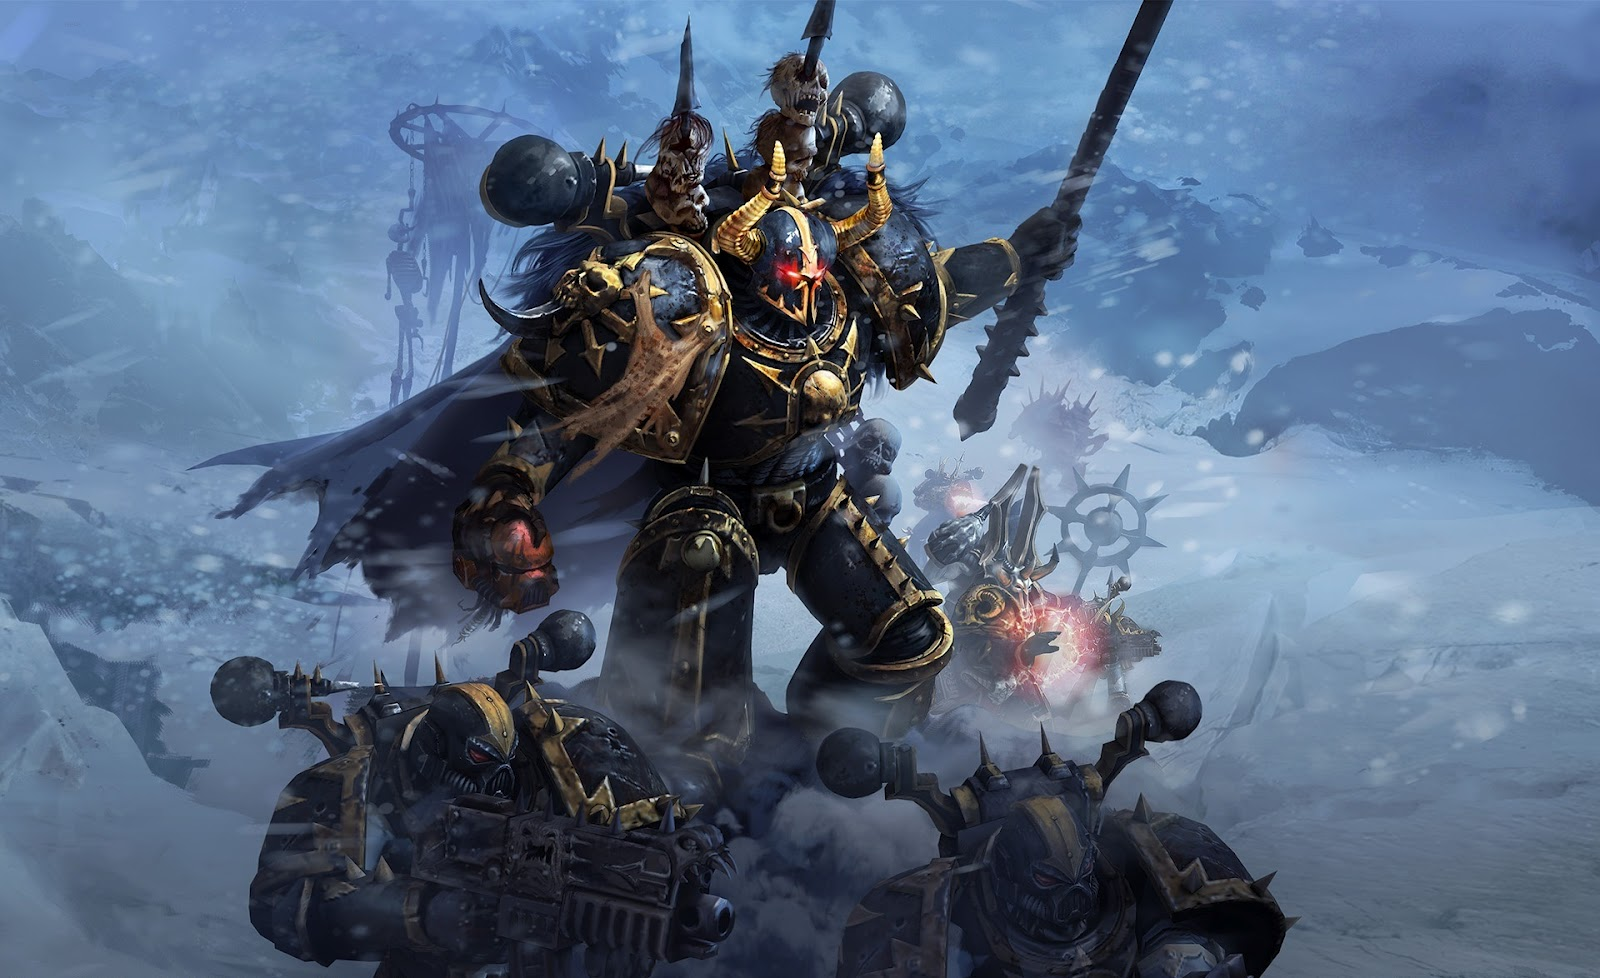 http://3.bp.blogspot.com/-yA73XfvO60w/T3sQSILR_FI/AAAAAAAAE40/wzEJyINrY_k/s1600/warhammer_40000_dawn_of_war_2_chaos_rising_wallpaper_01.jpg